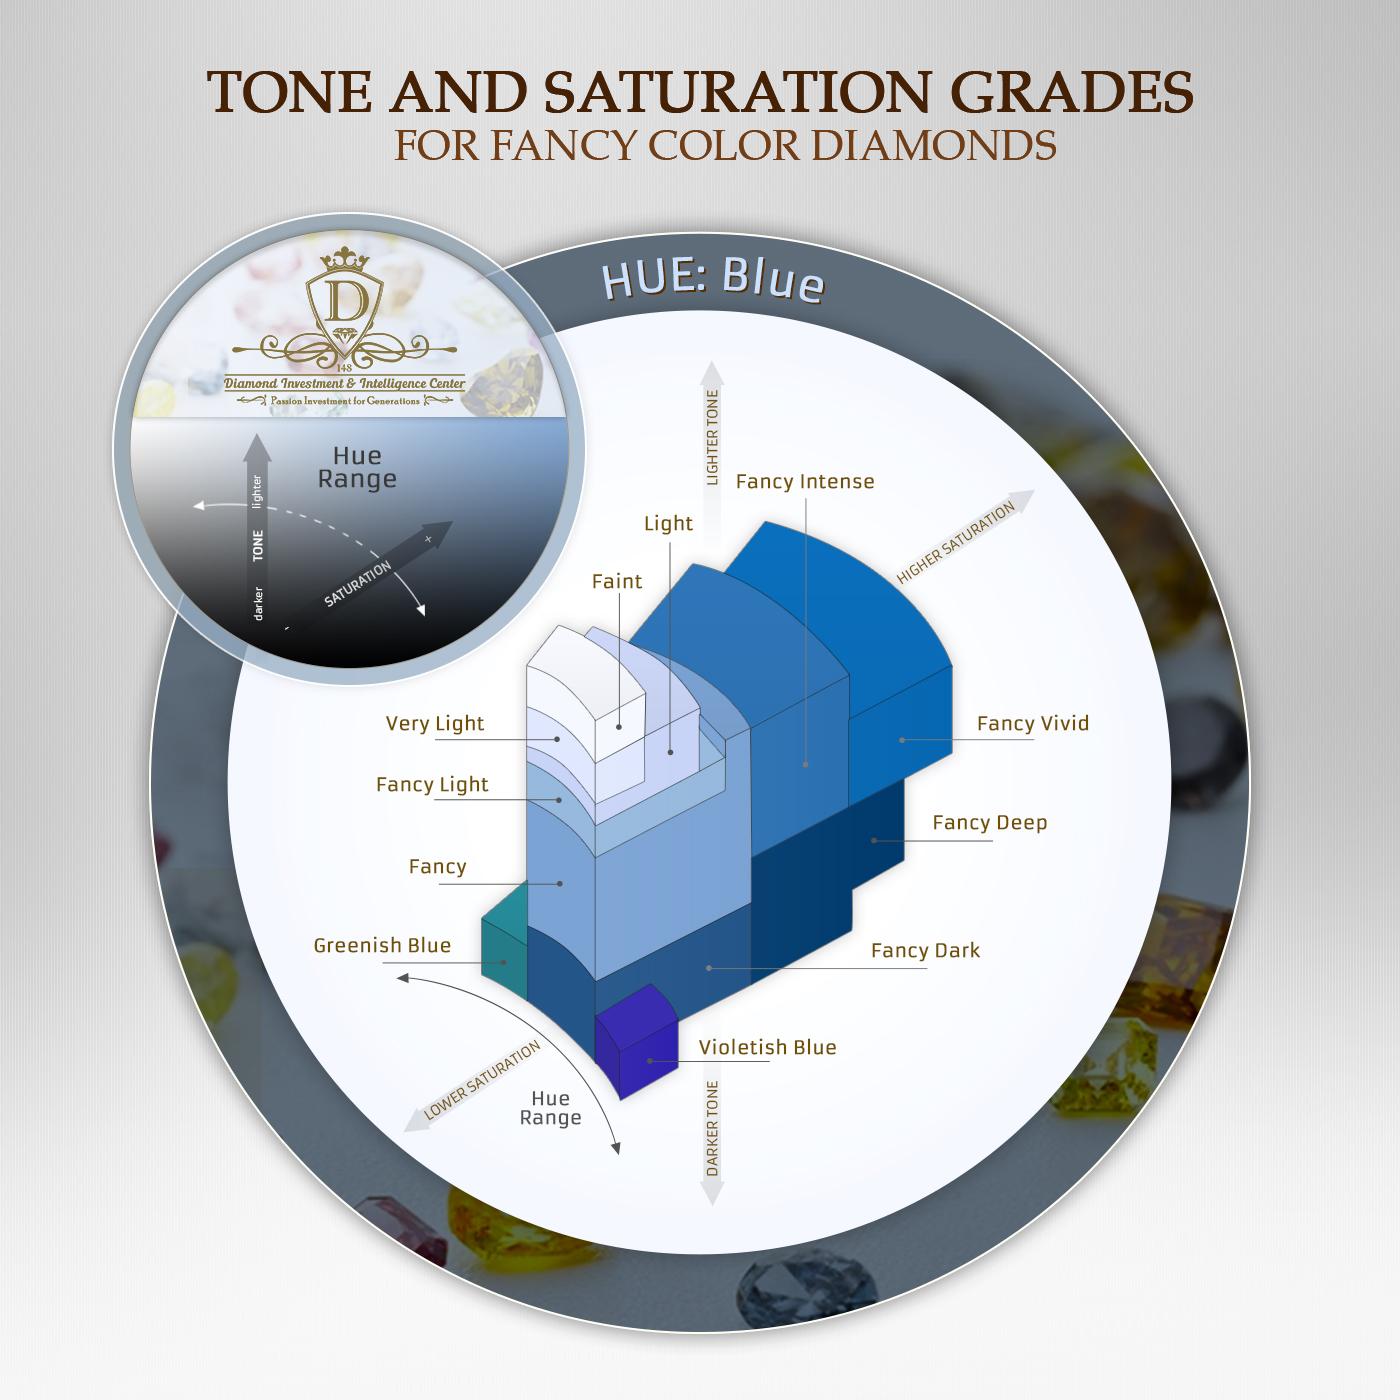 Blue Diamonds tone and saturation grades